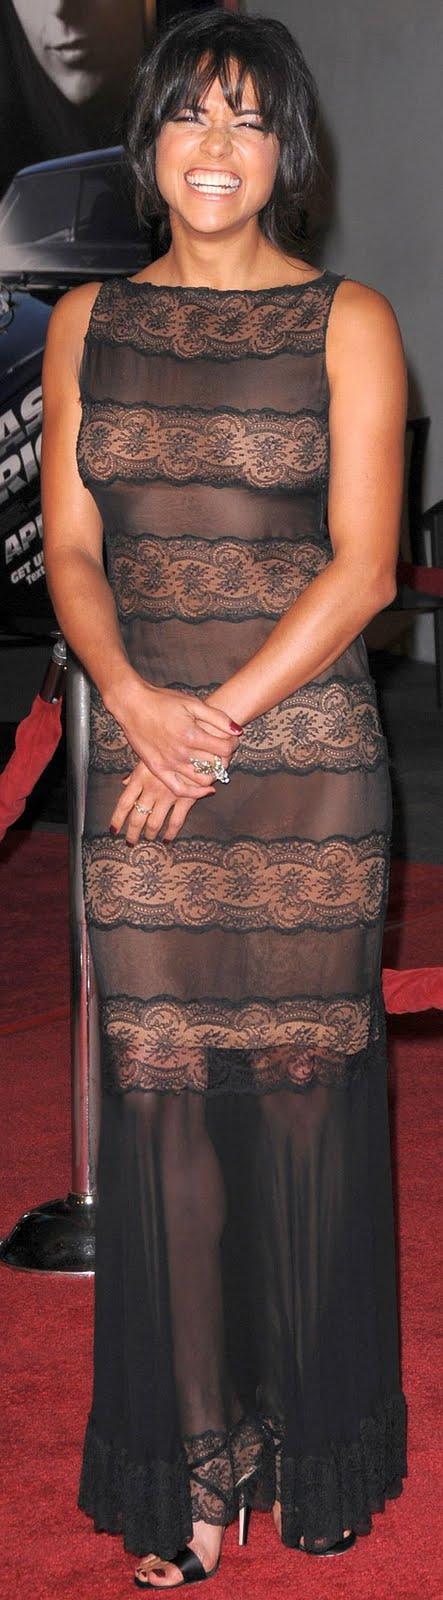 Michelle Rodriguez See Through Dress | King Babes Magazine